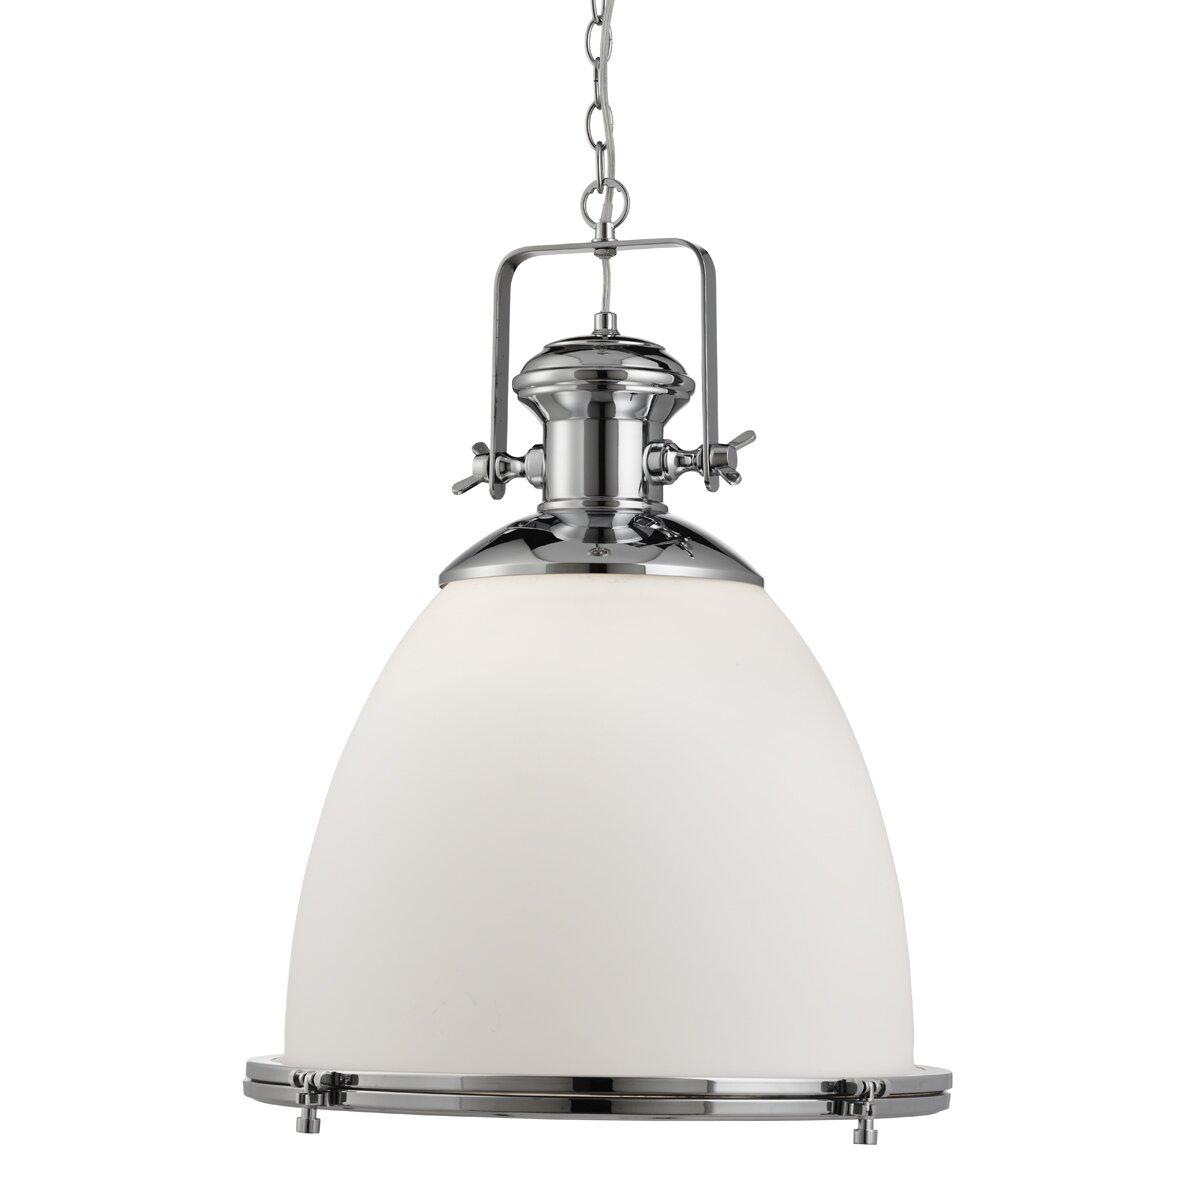 Industrial Mini Pendant Light: Searchlight Industrial Pendants 1 Light Mini Pendant